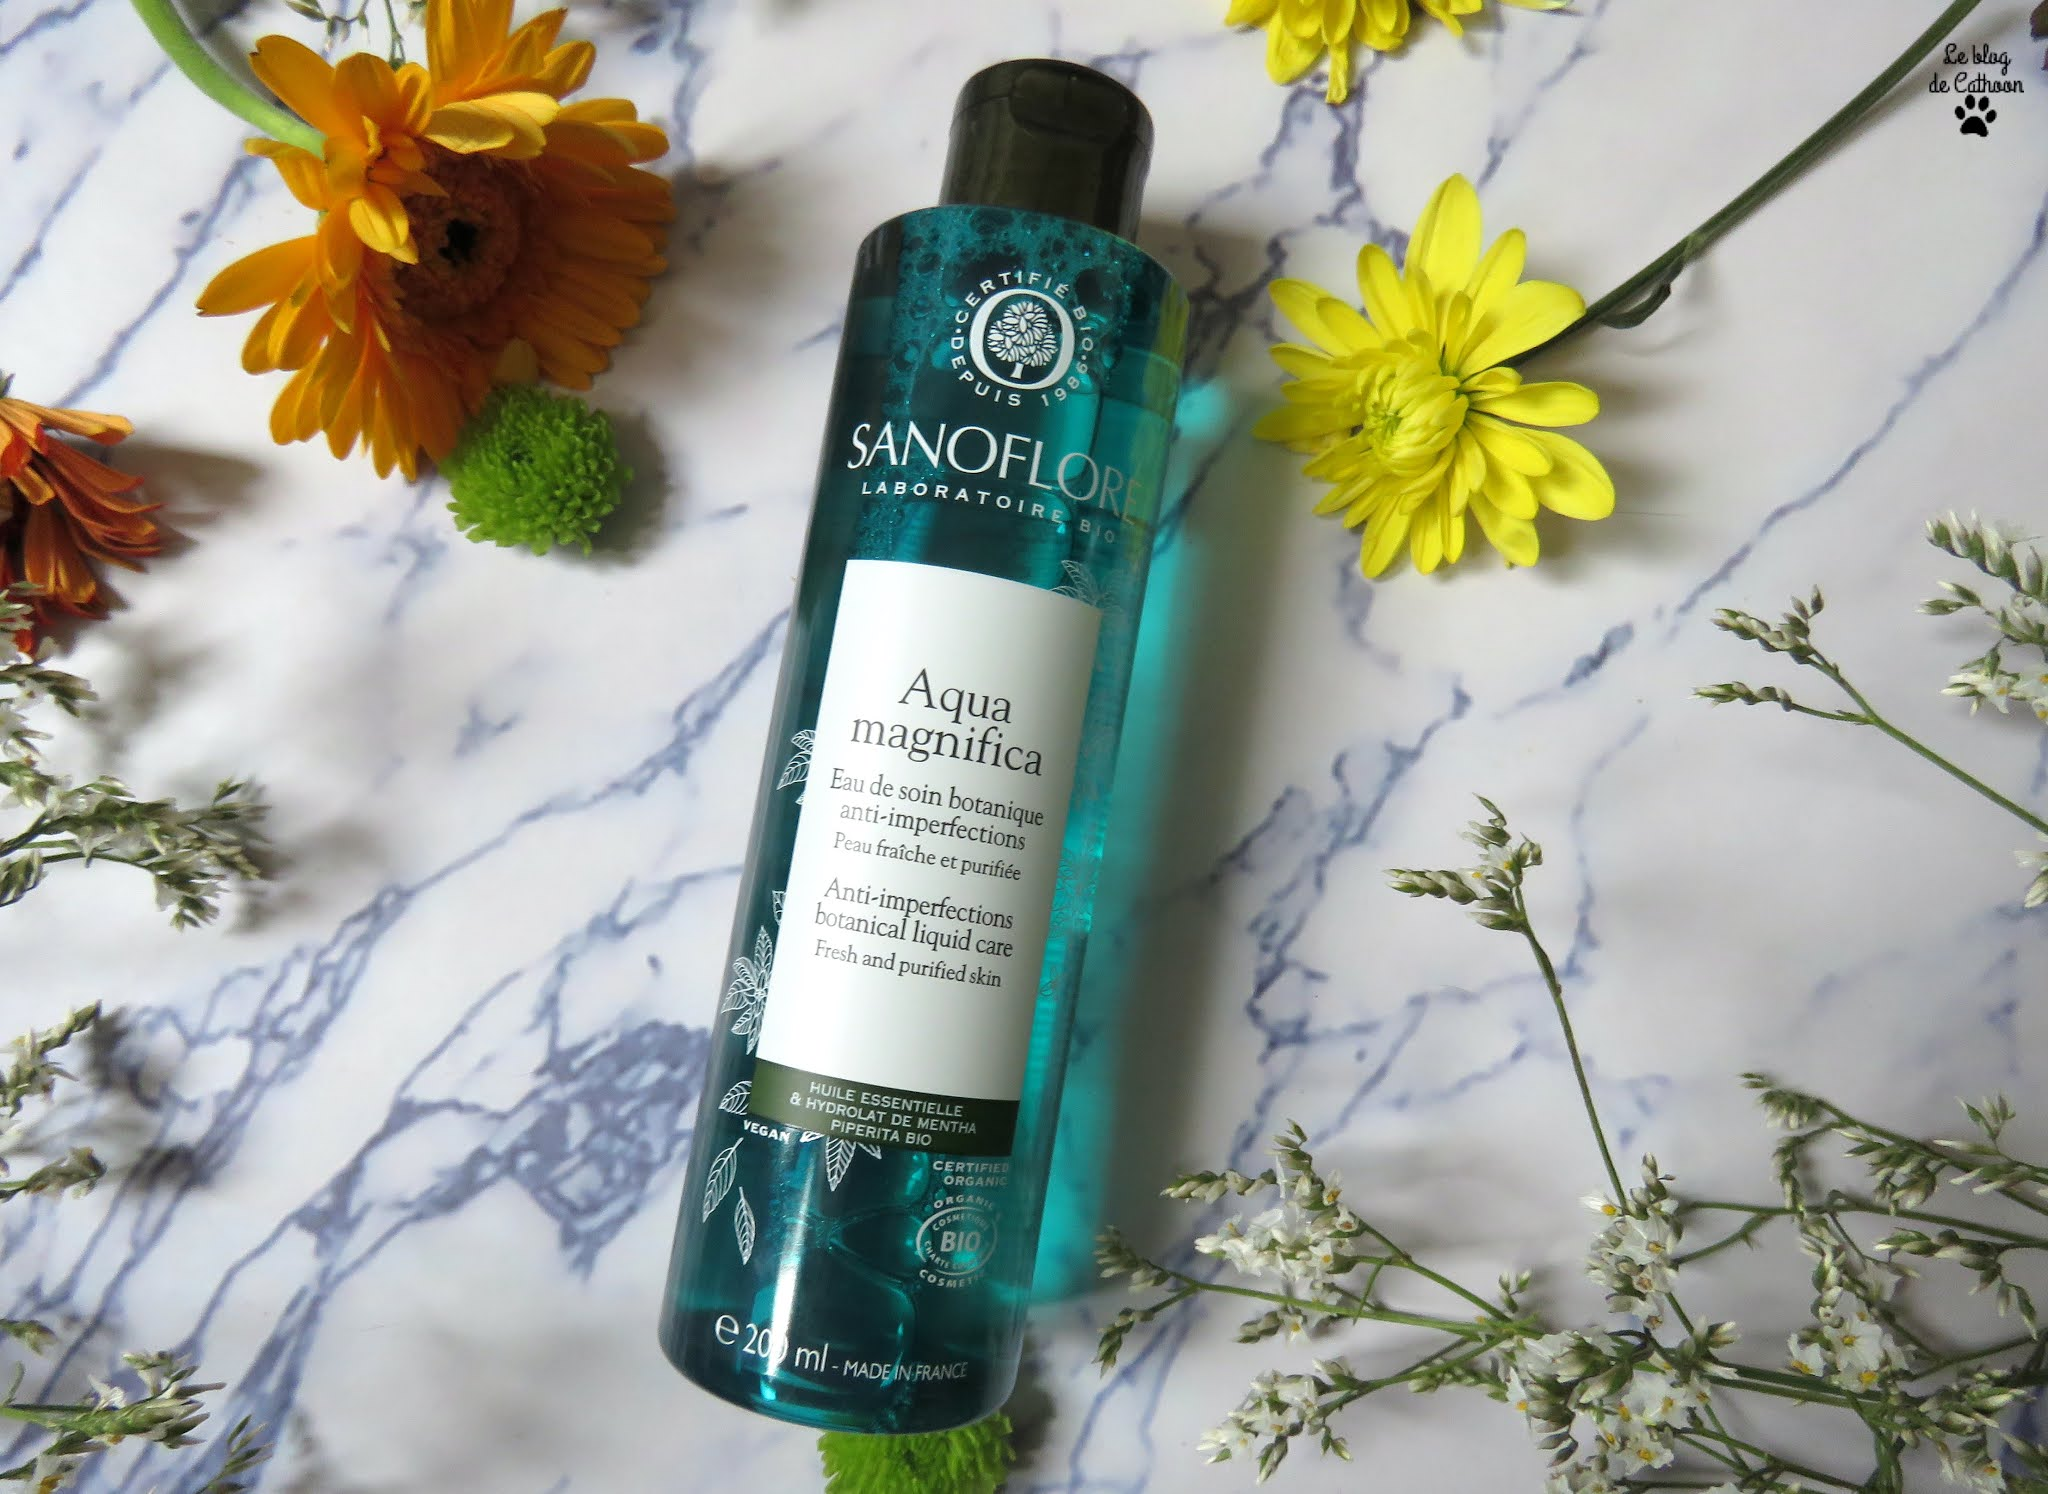 Aqua Magnifica - Eau de Soin Botanique Anti-imperfections - Sanoflore